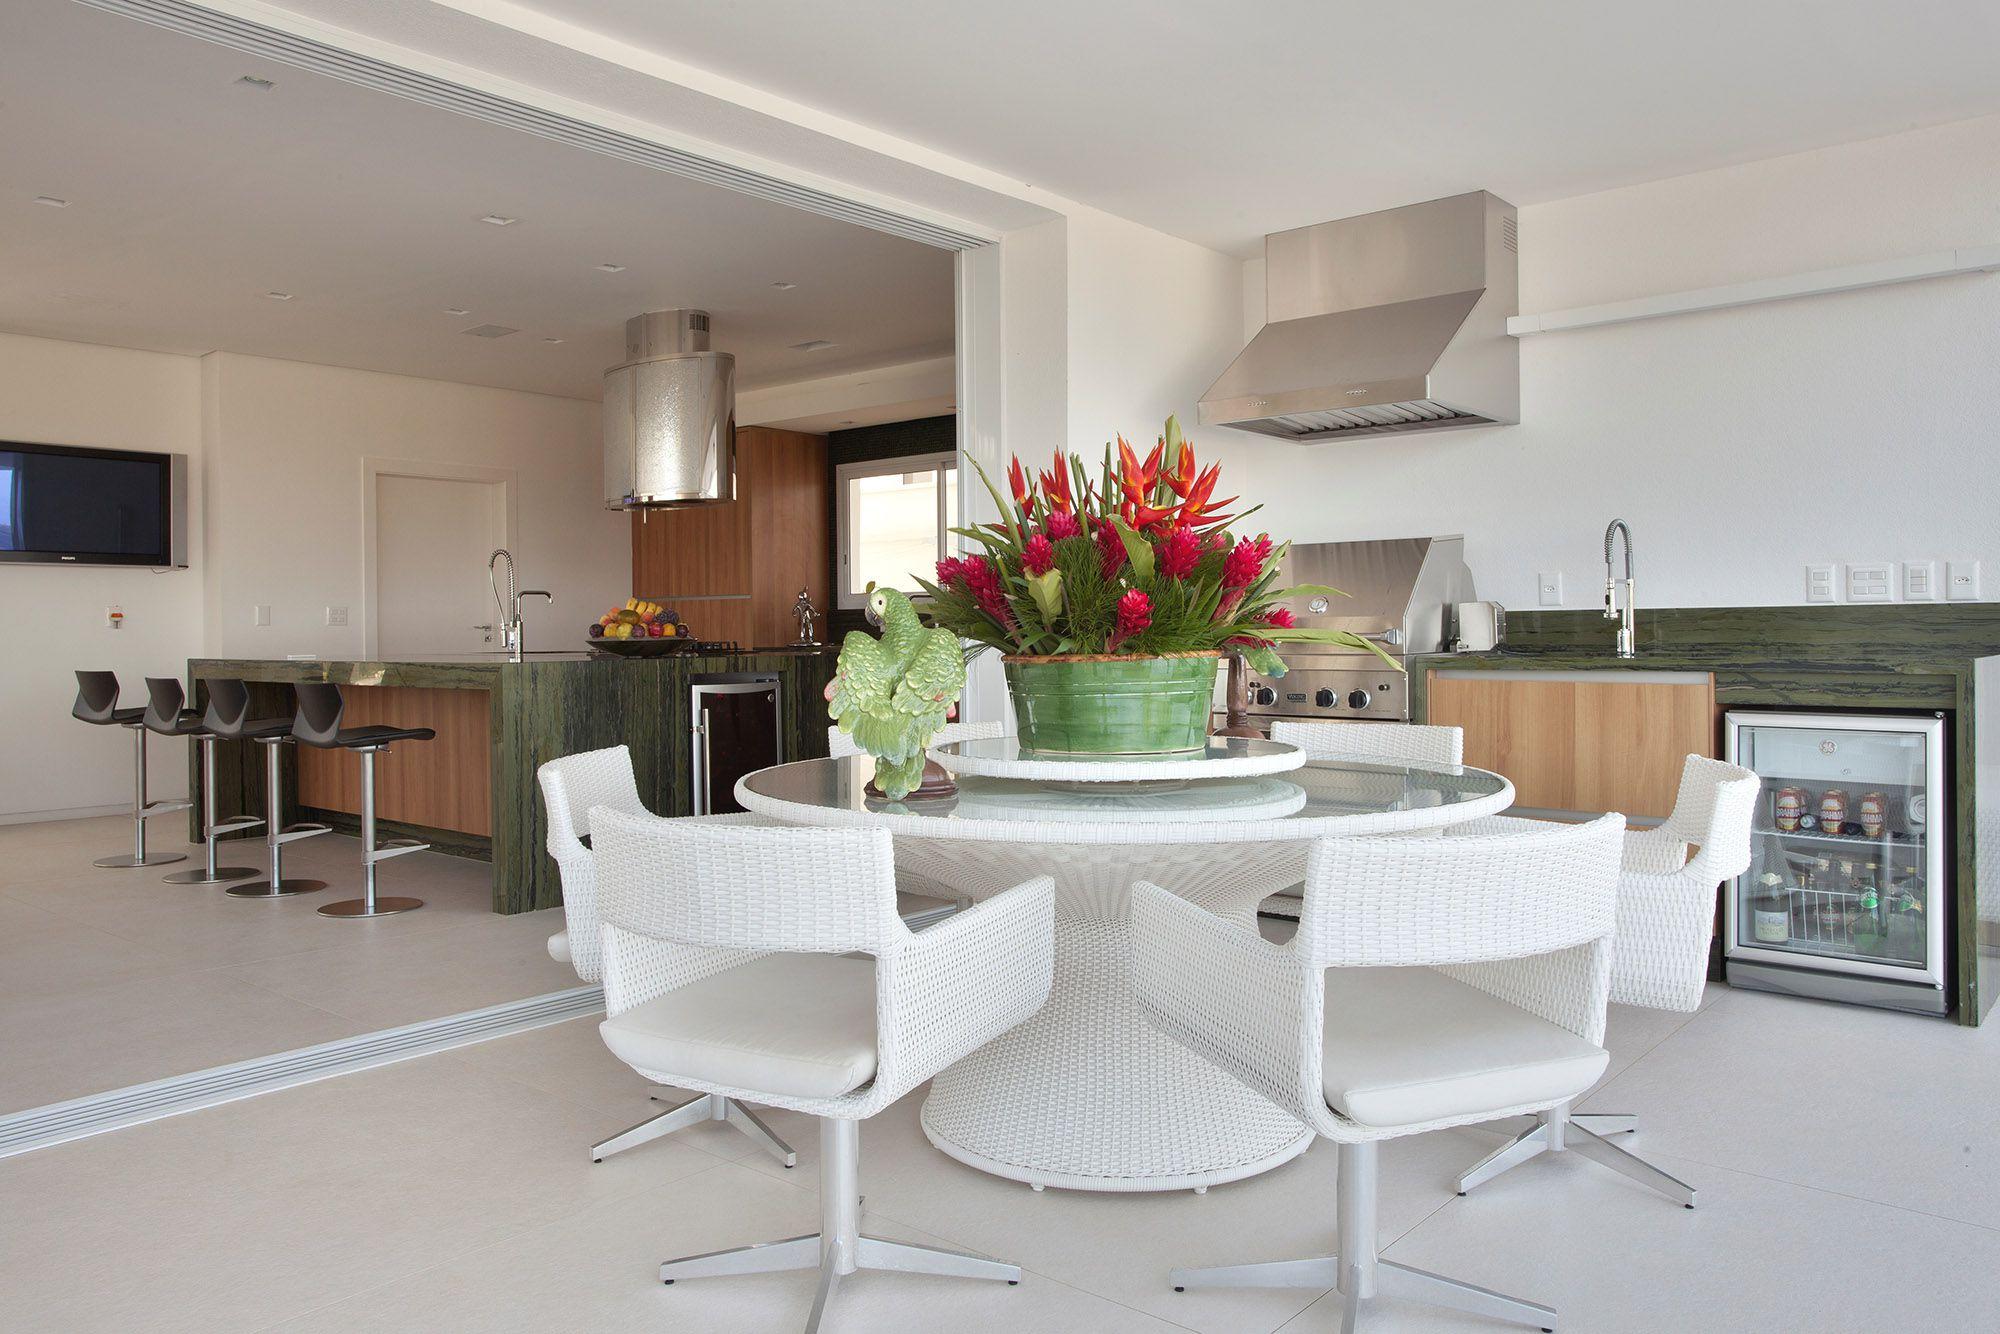 Residence jn by pupogaspar arquitetura e interiores - Sublimissime residencia nj pupogaspar arquitetura ...